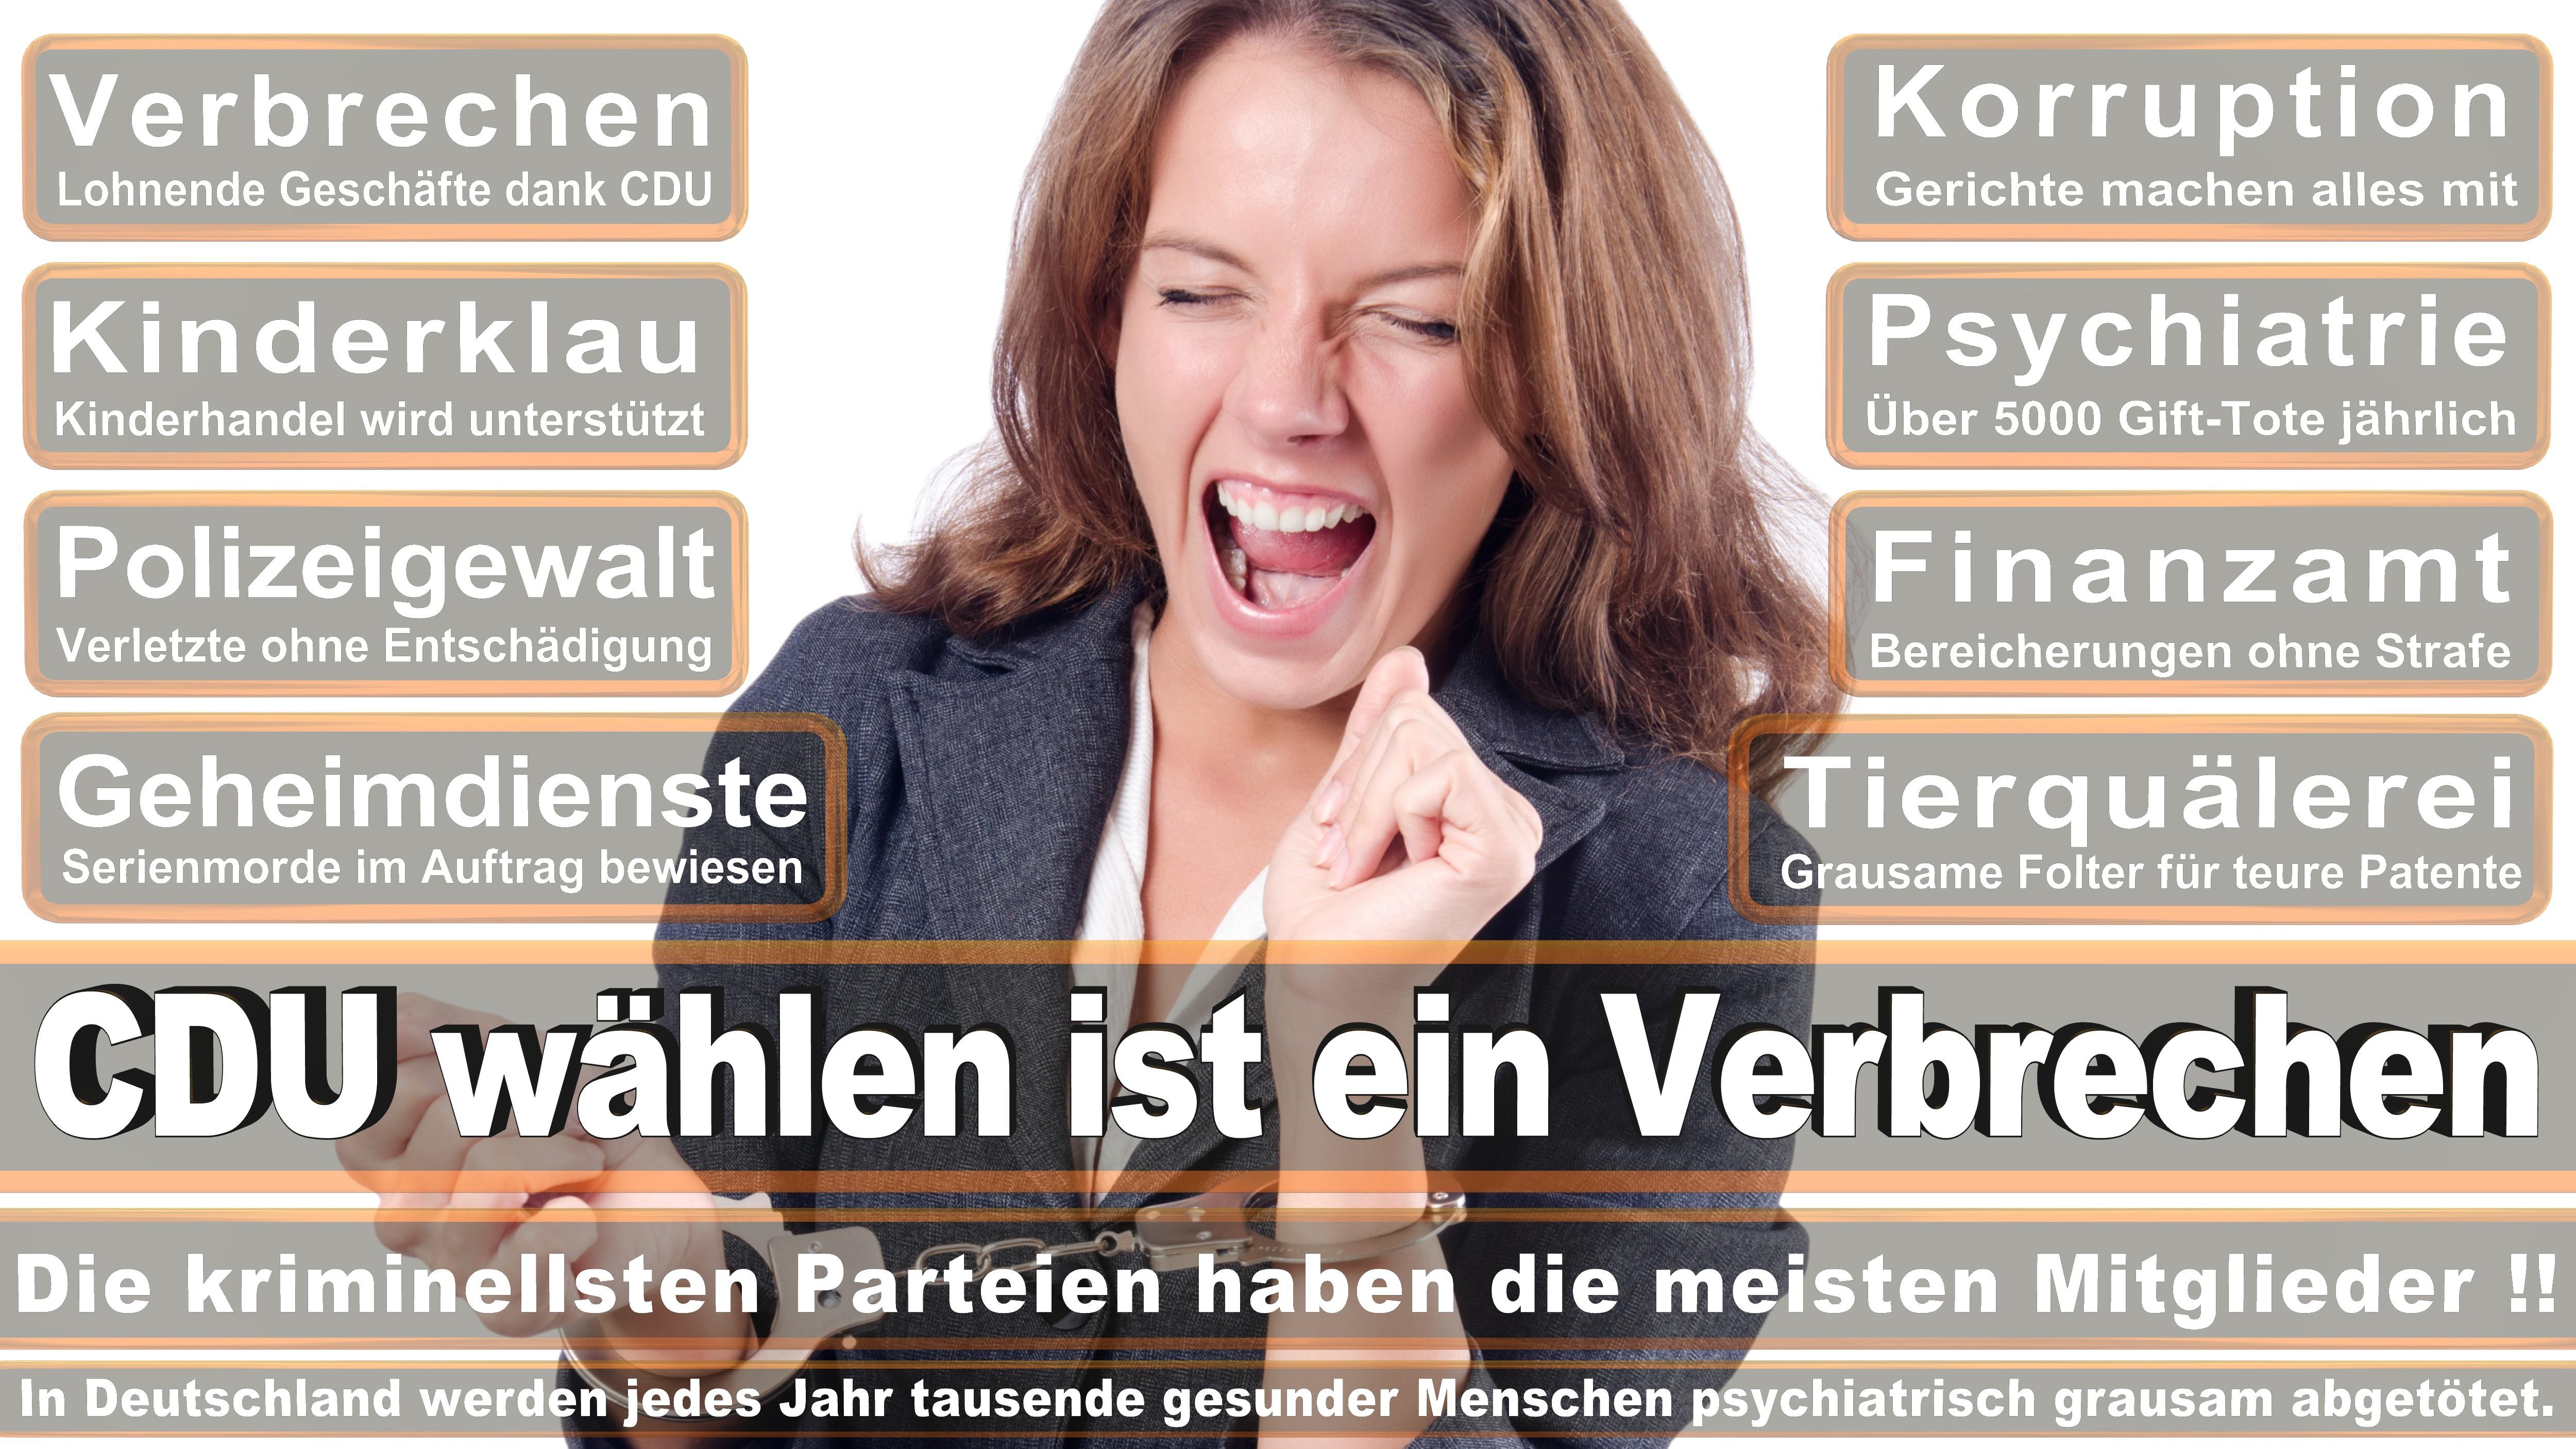 Marco Wanderwitz CDU CSU Politiker